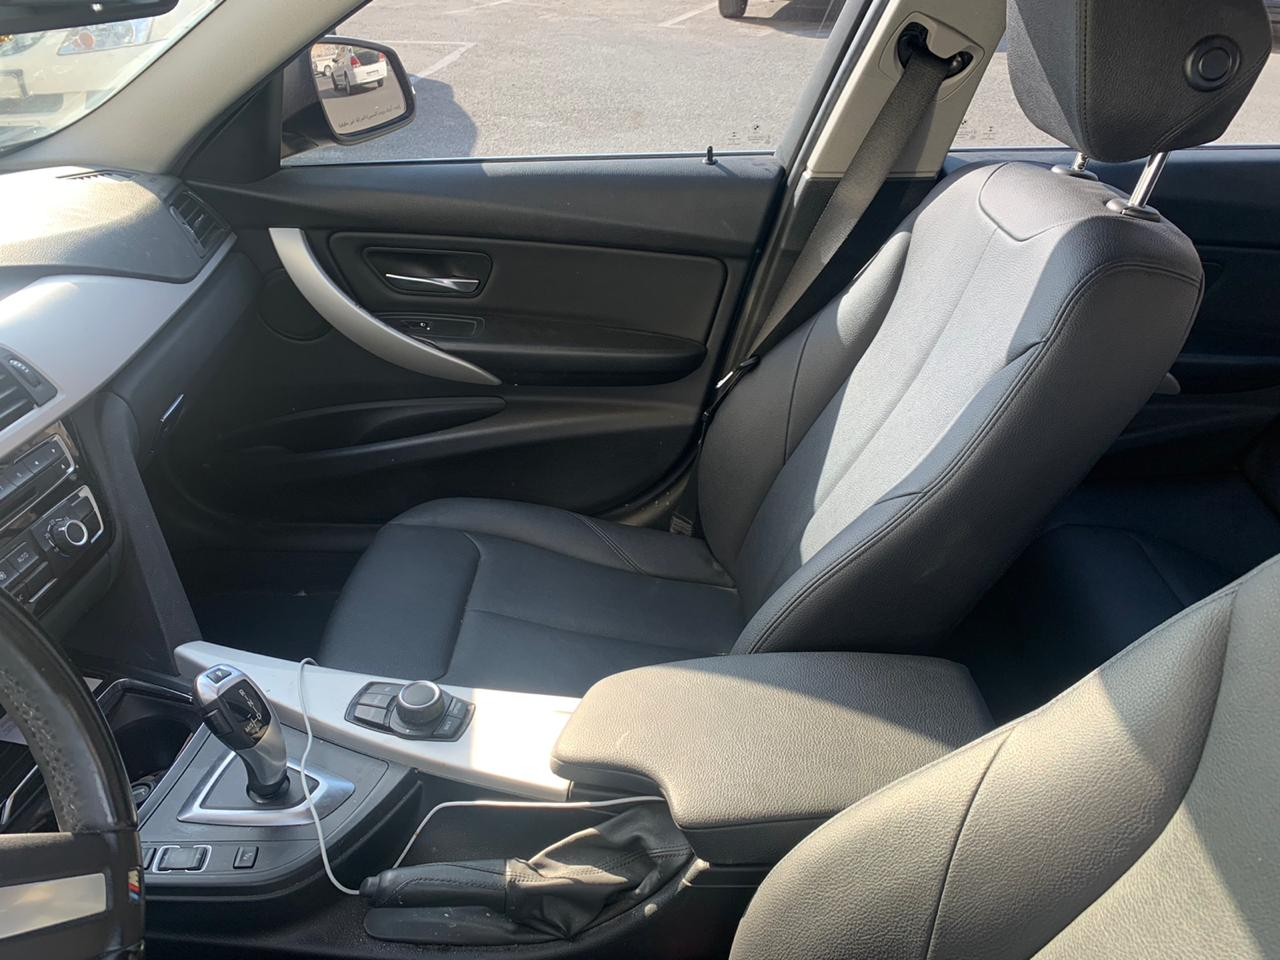 BMW 318i Metal Grey in Dubai - Image 9